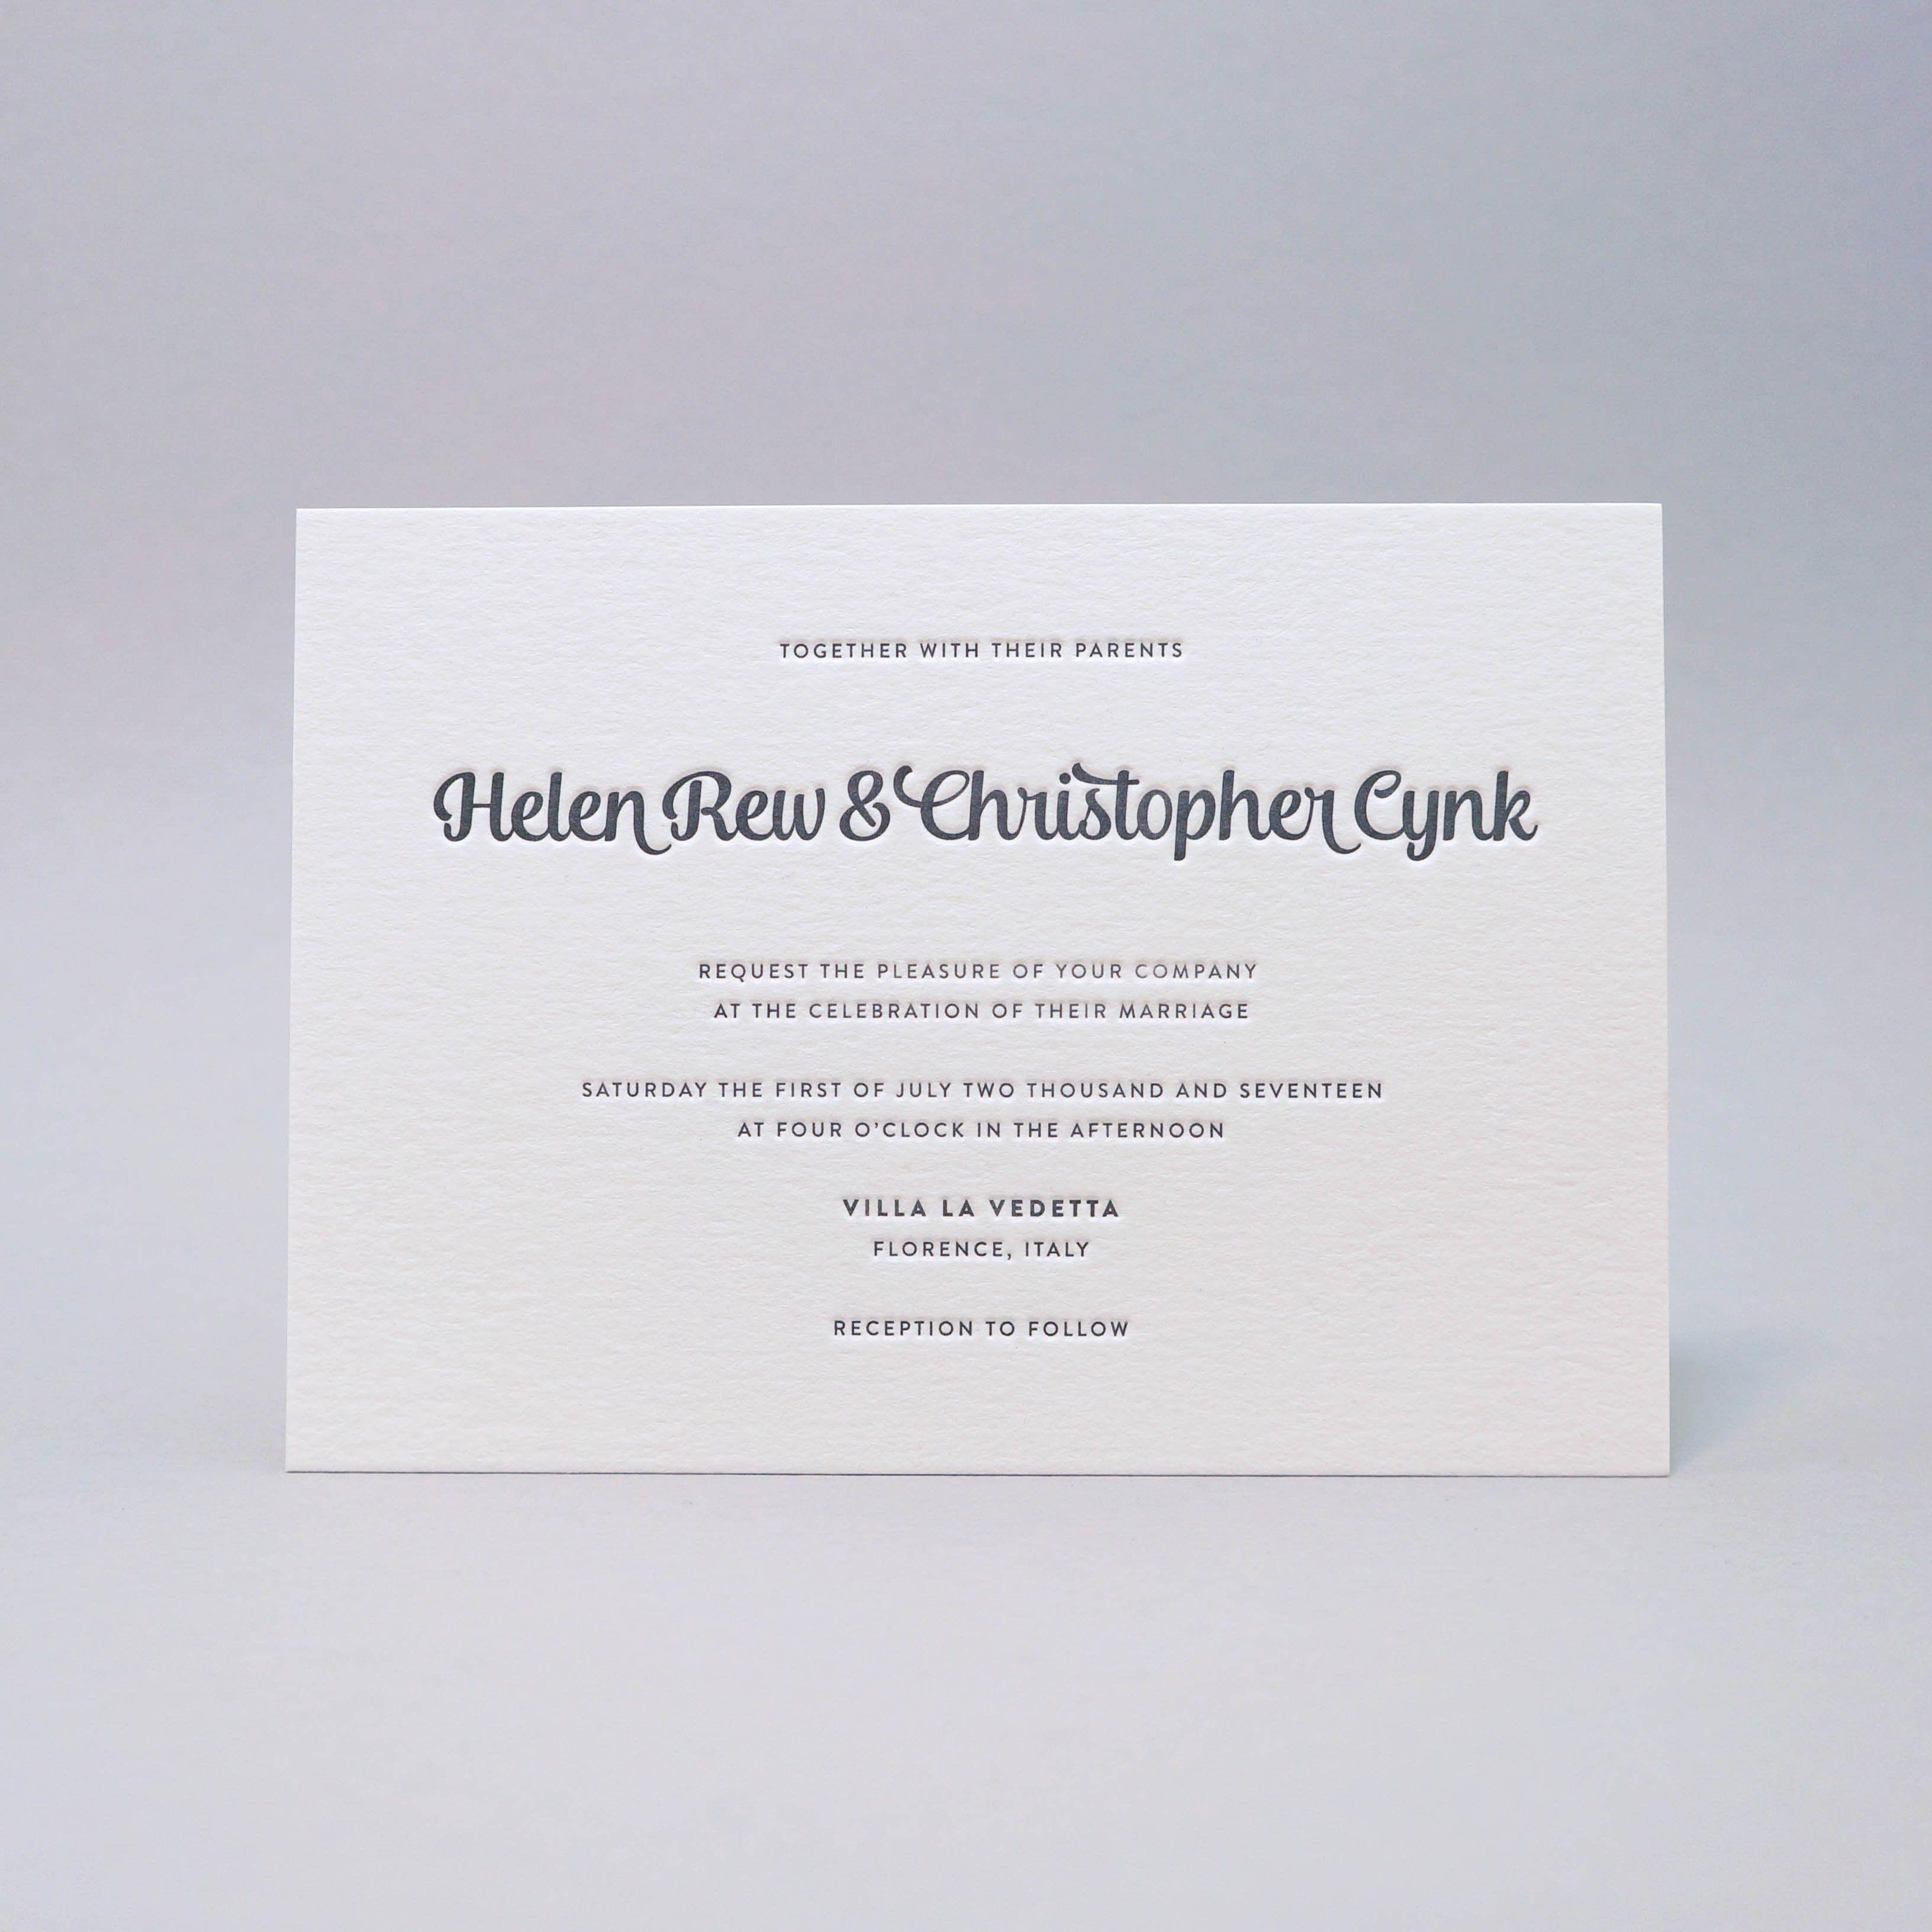 Helen u christopher crafted by dud letterpress wedding invitations